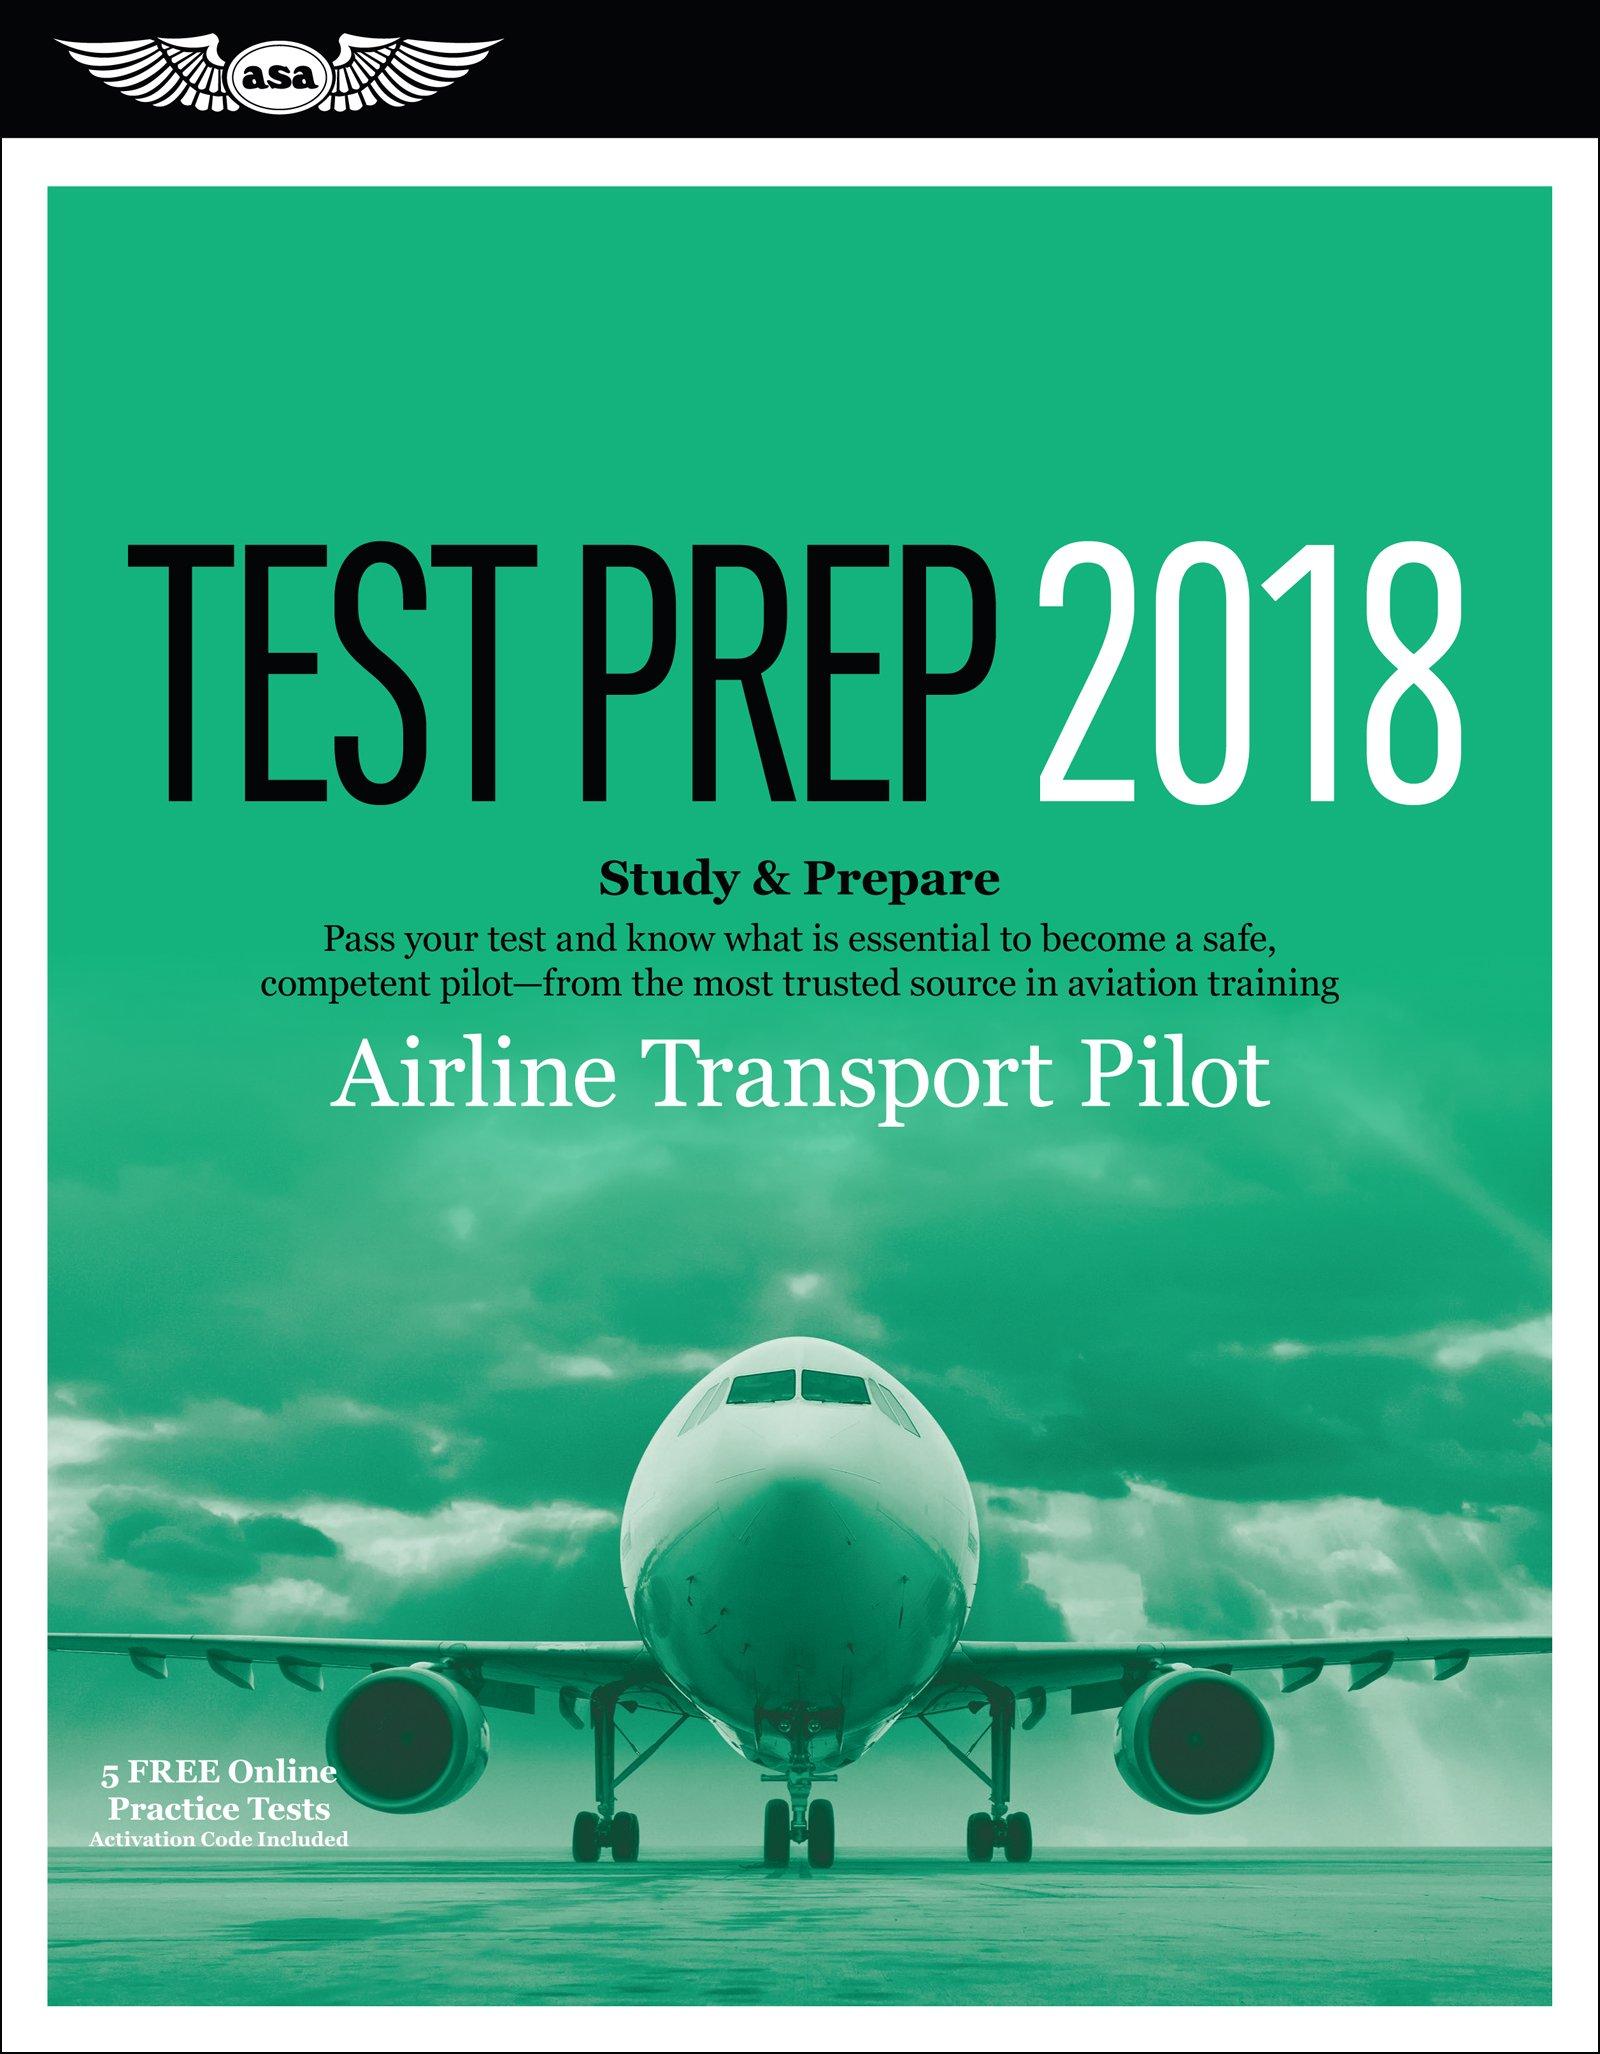 Airline Transport Pilot Test Prep 2018: Study & Prepare: Pass your